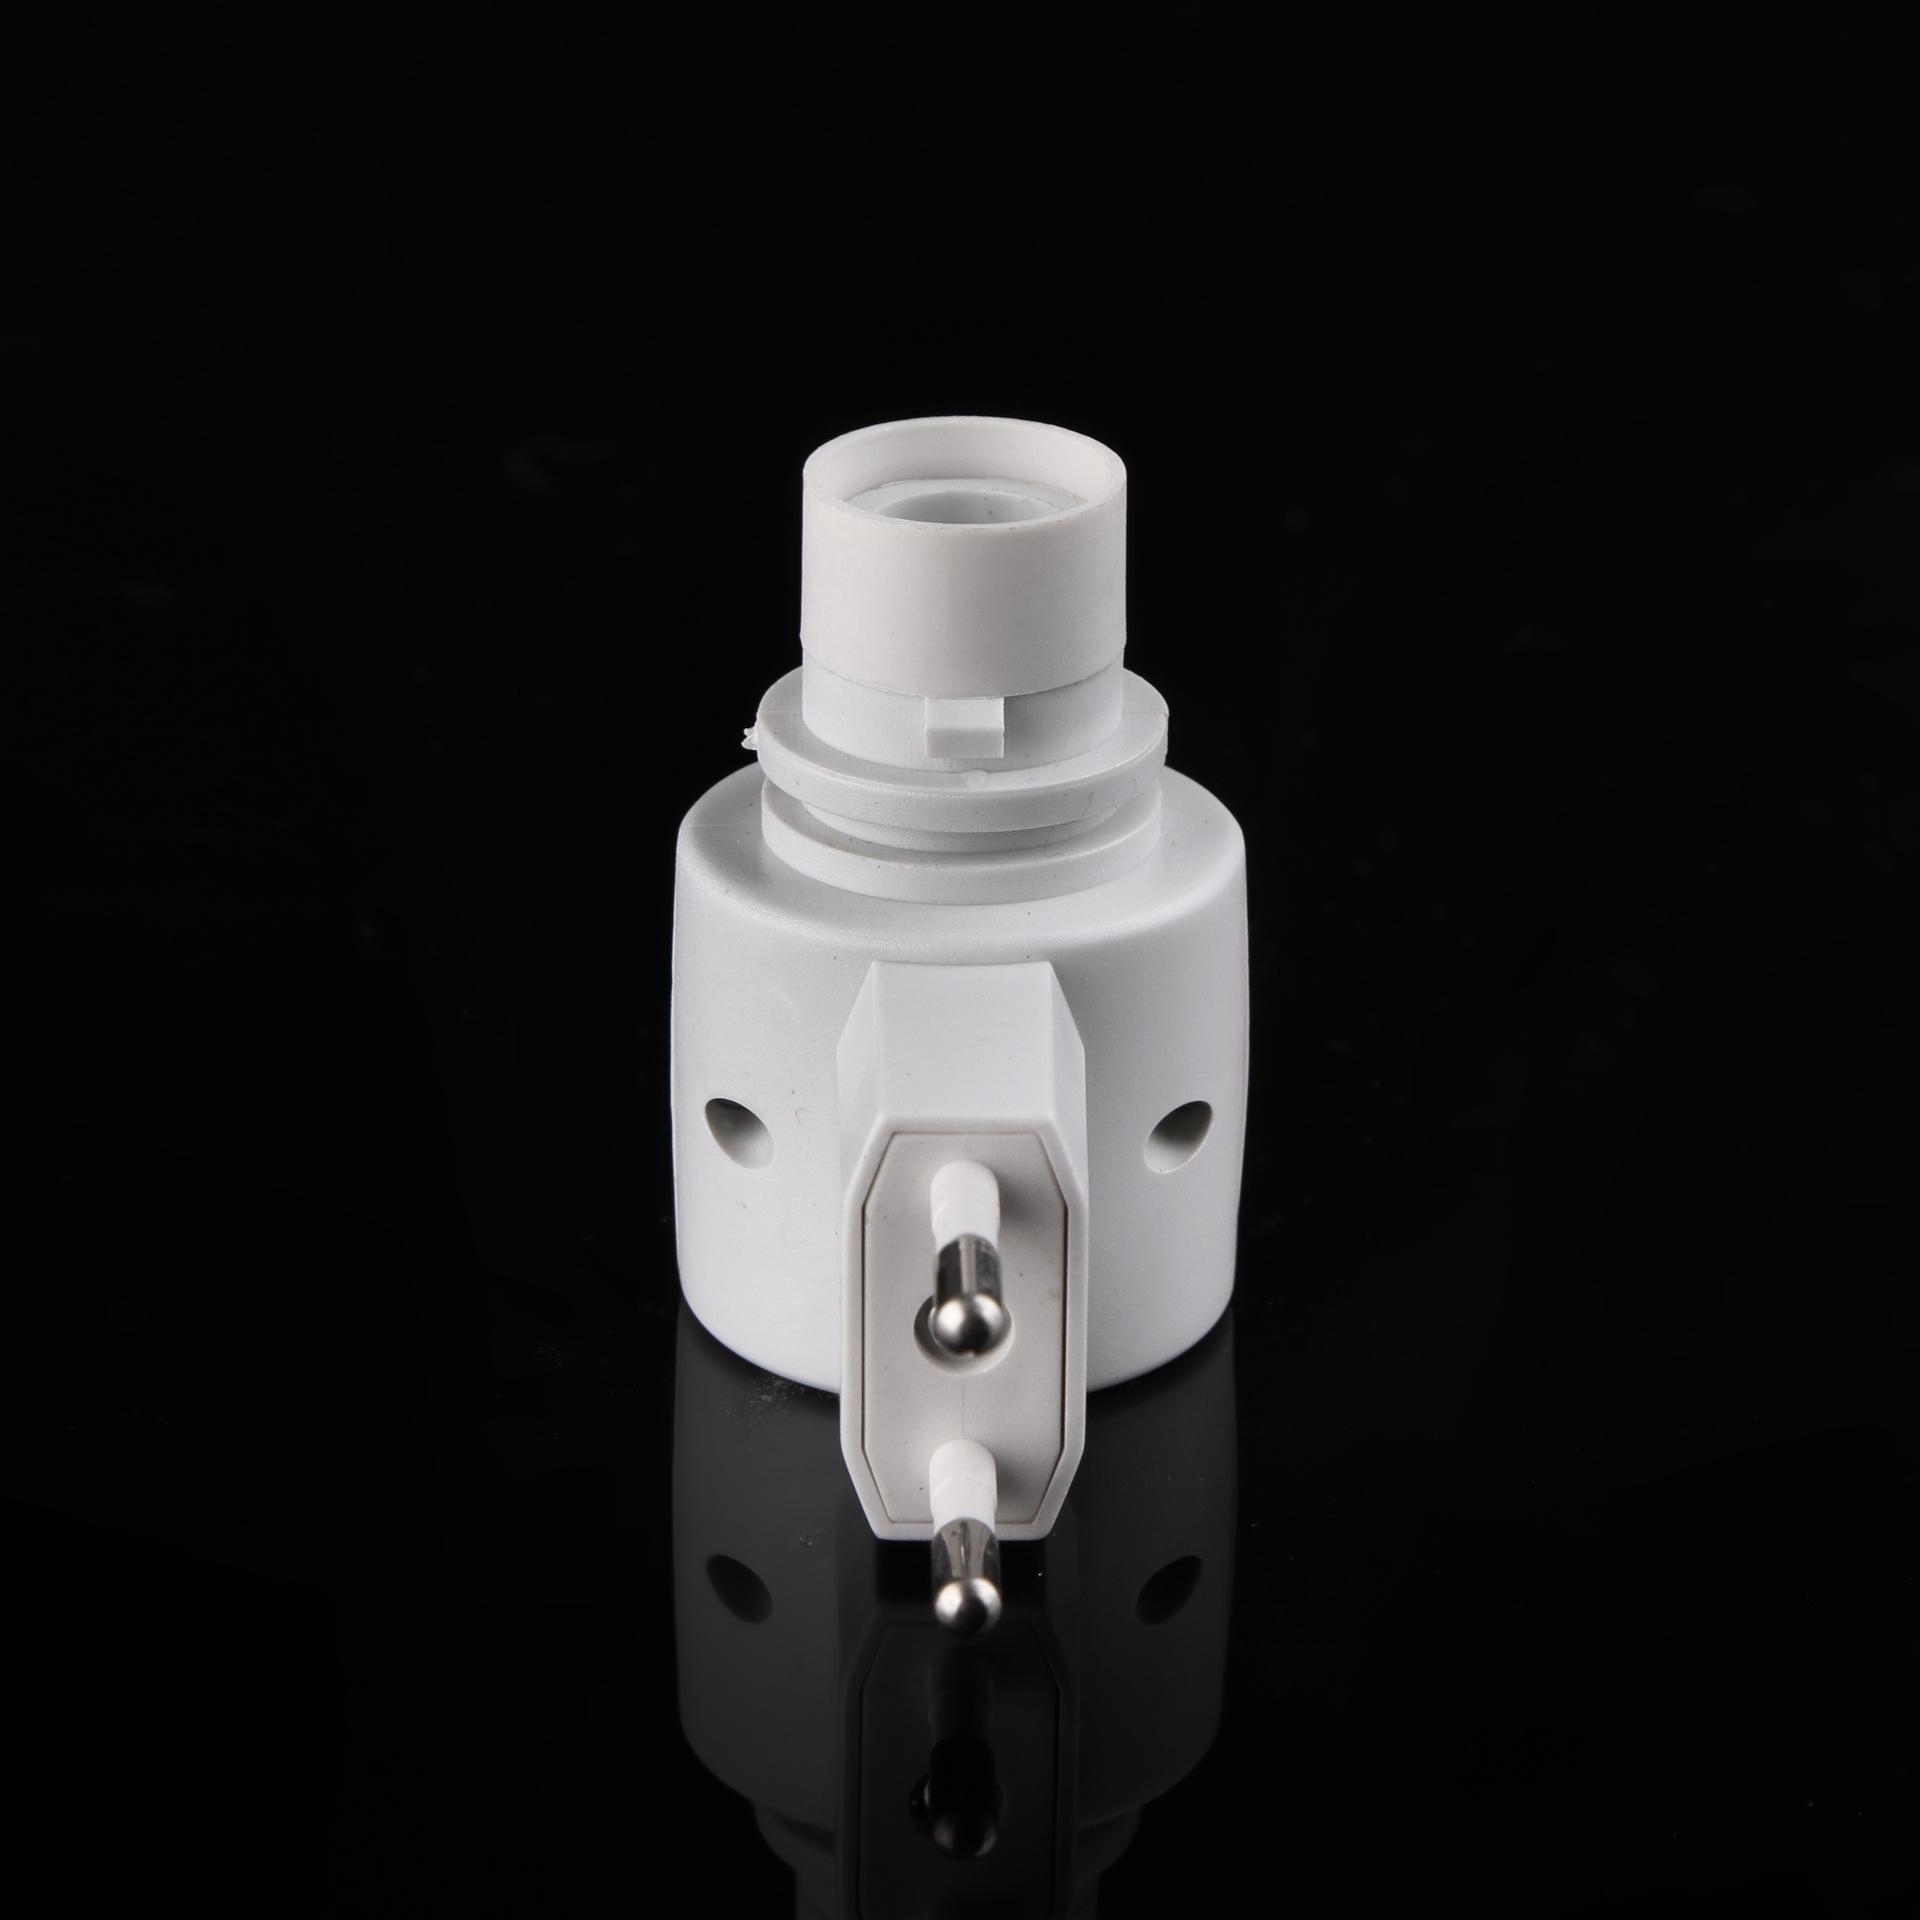 factory price night light part e12 electrical plug socket lamp holder plug base